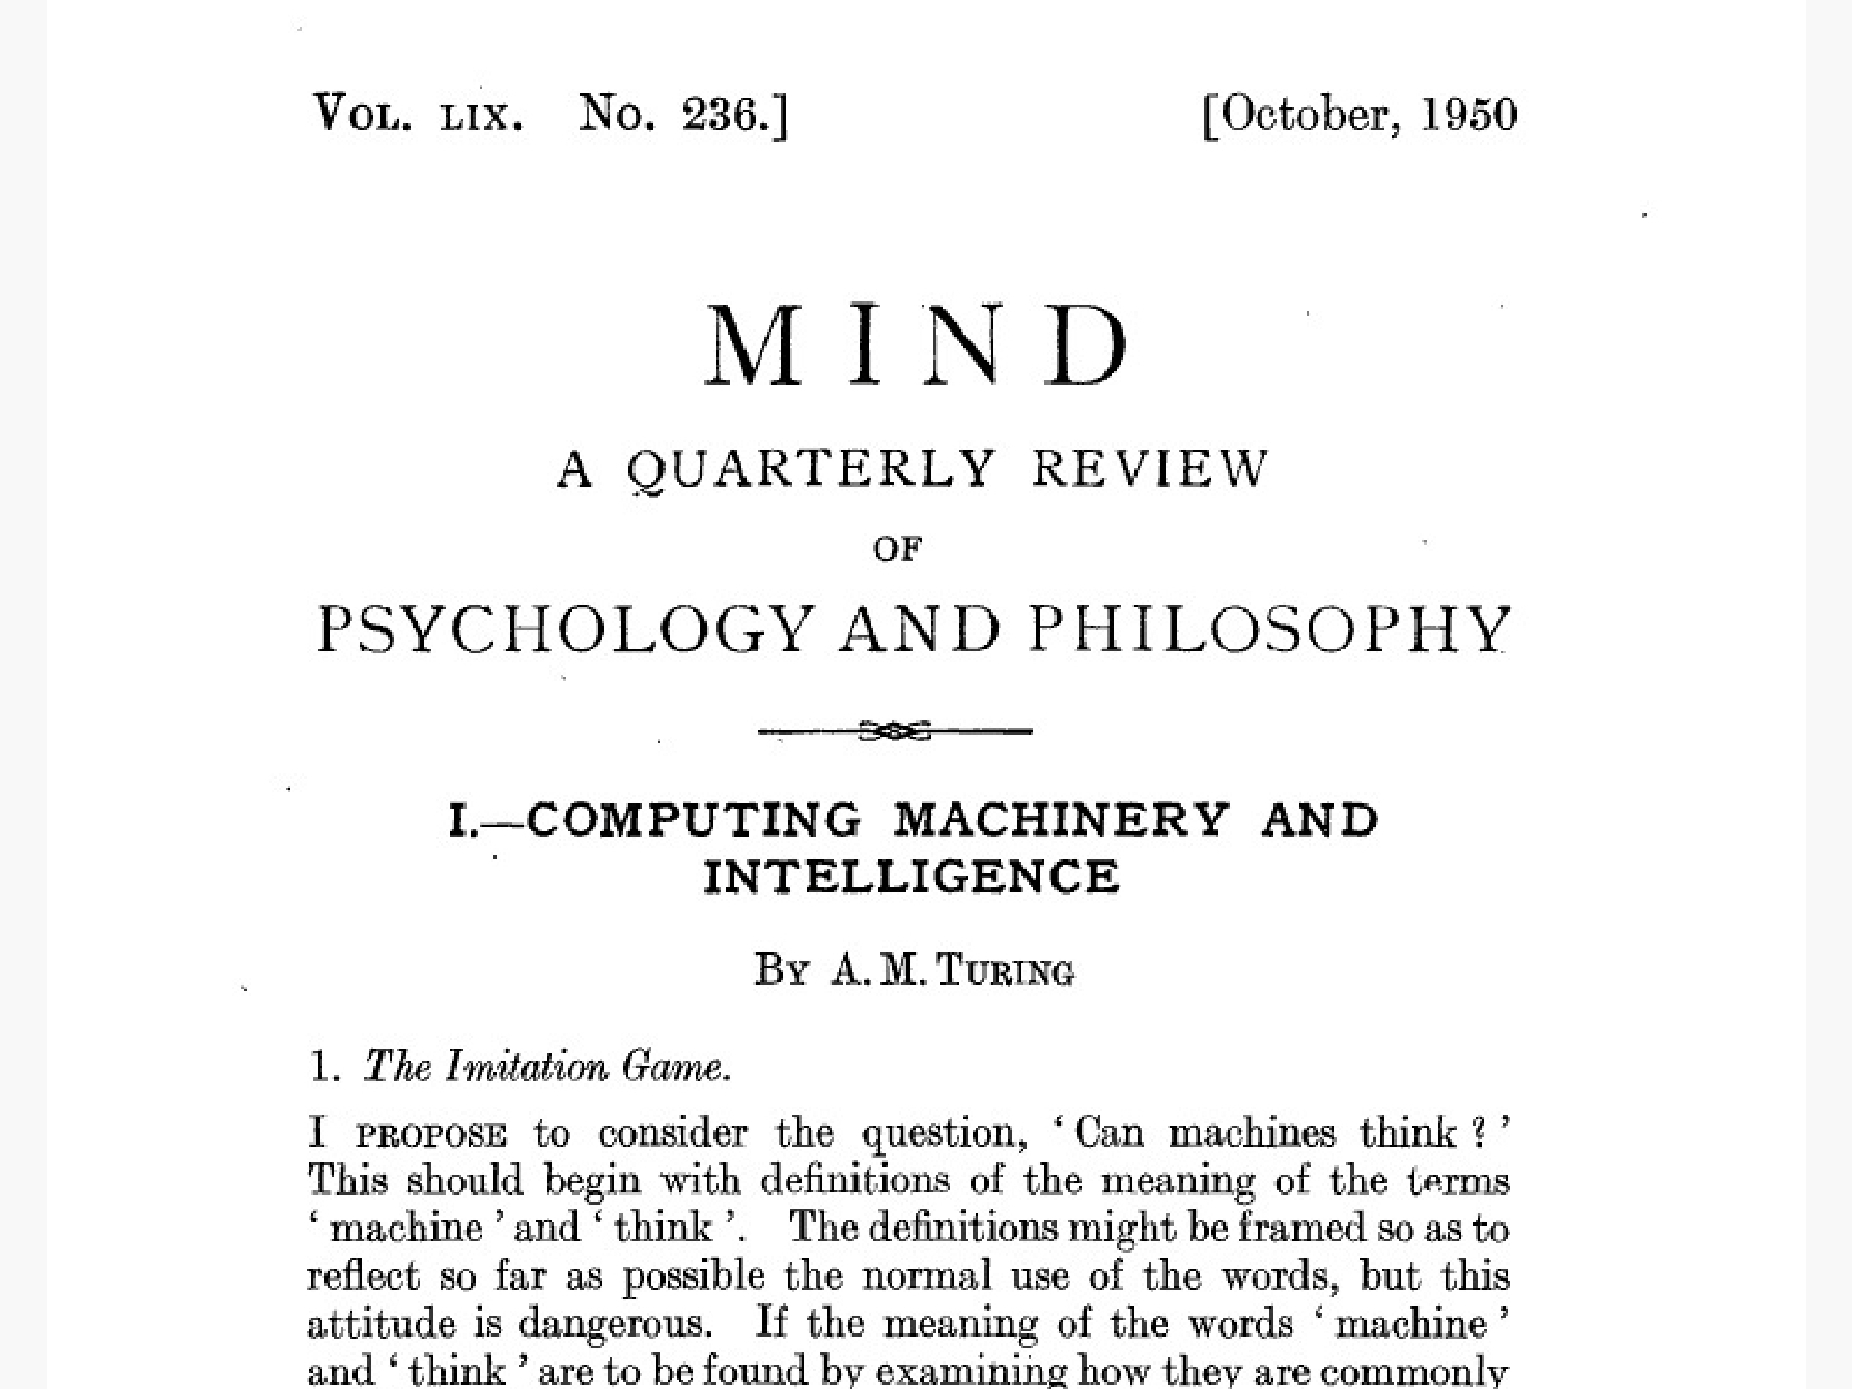 computing machinery and intelligence Computing machinery and intelligence author(s): a m turing source: mind, new series, vol 59, no 236 (oct, 1950), pp 433-460.